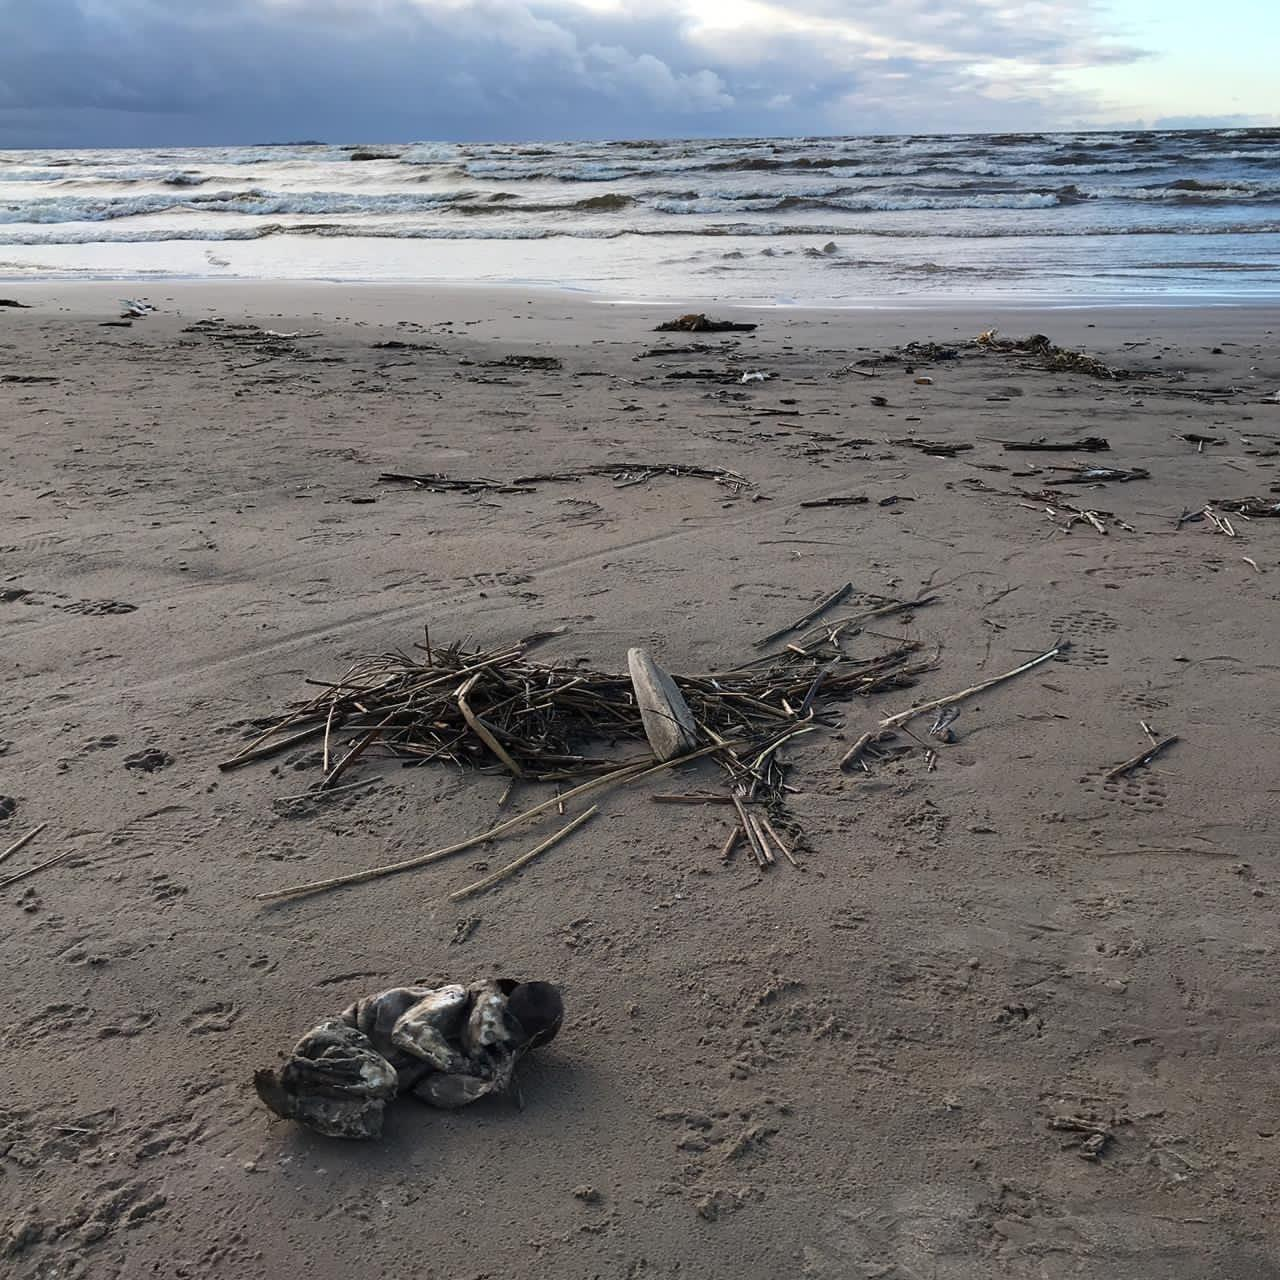 На берегу Финского залива было обнаружено непонятное существо